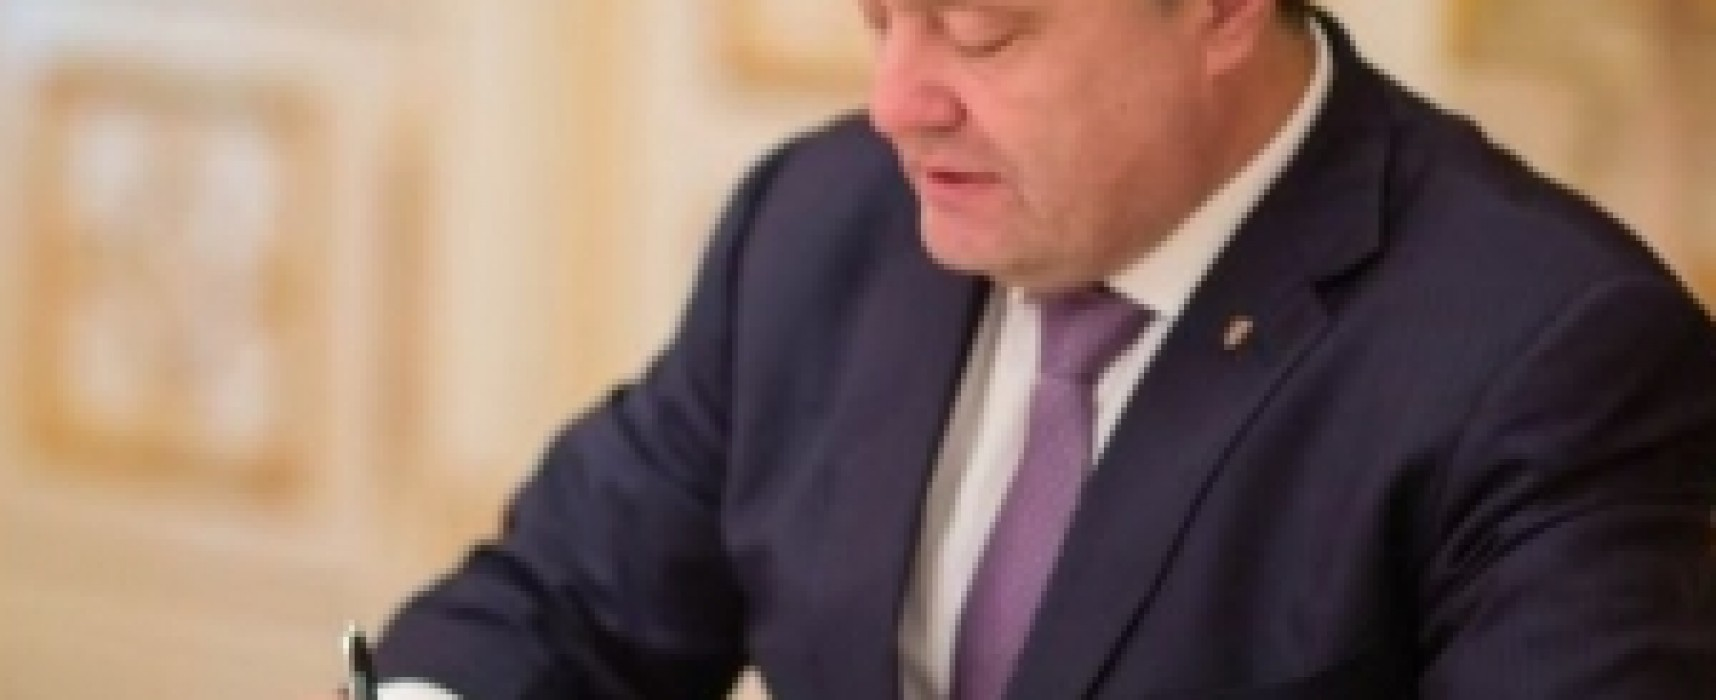 "Fake: Poroshenko Asks Verkhovna Rada to Classify Budget as ""Secret"""